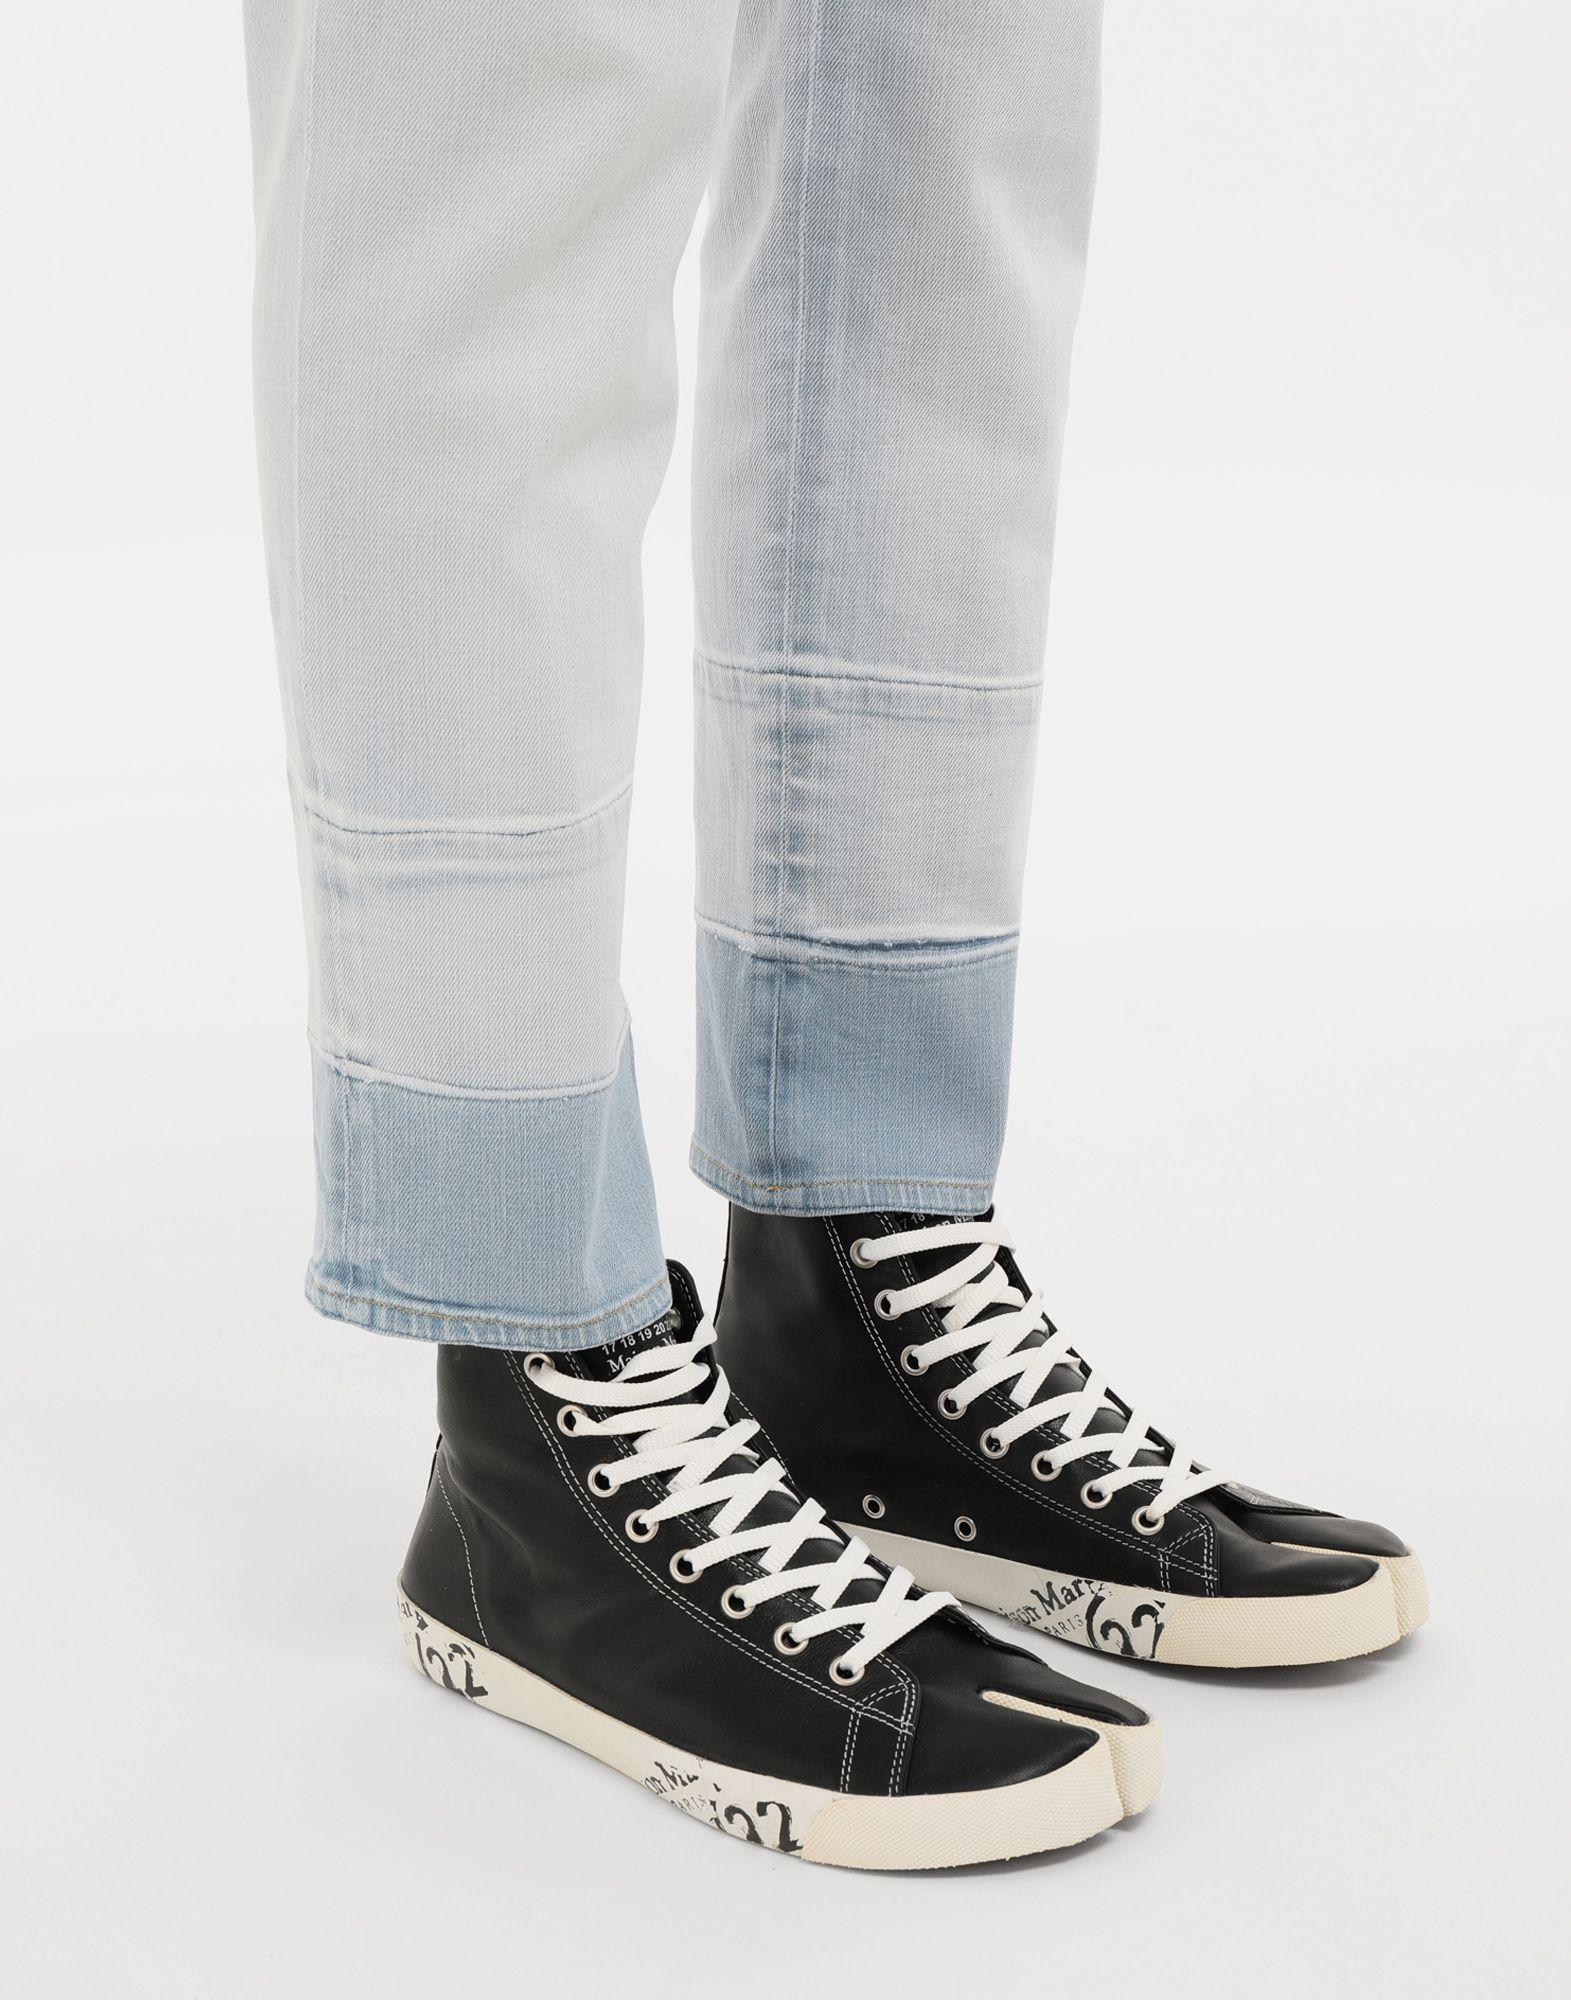 MAISON MARGIELA Tabi high top leather sneakers Sneakers Tabi Man b